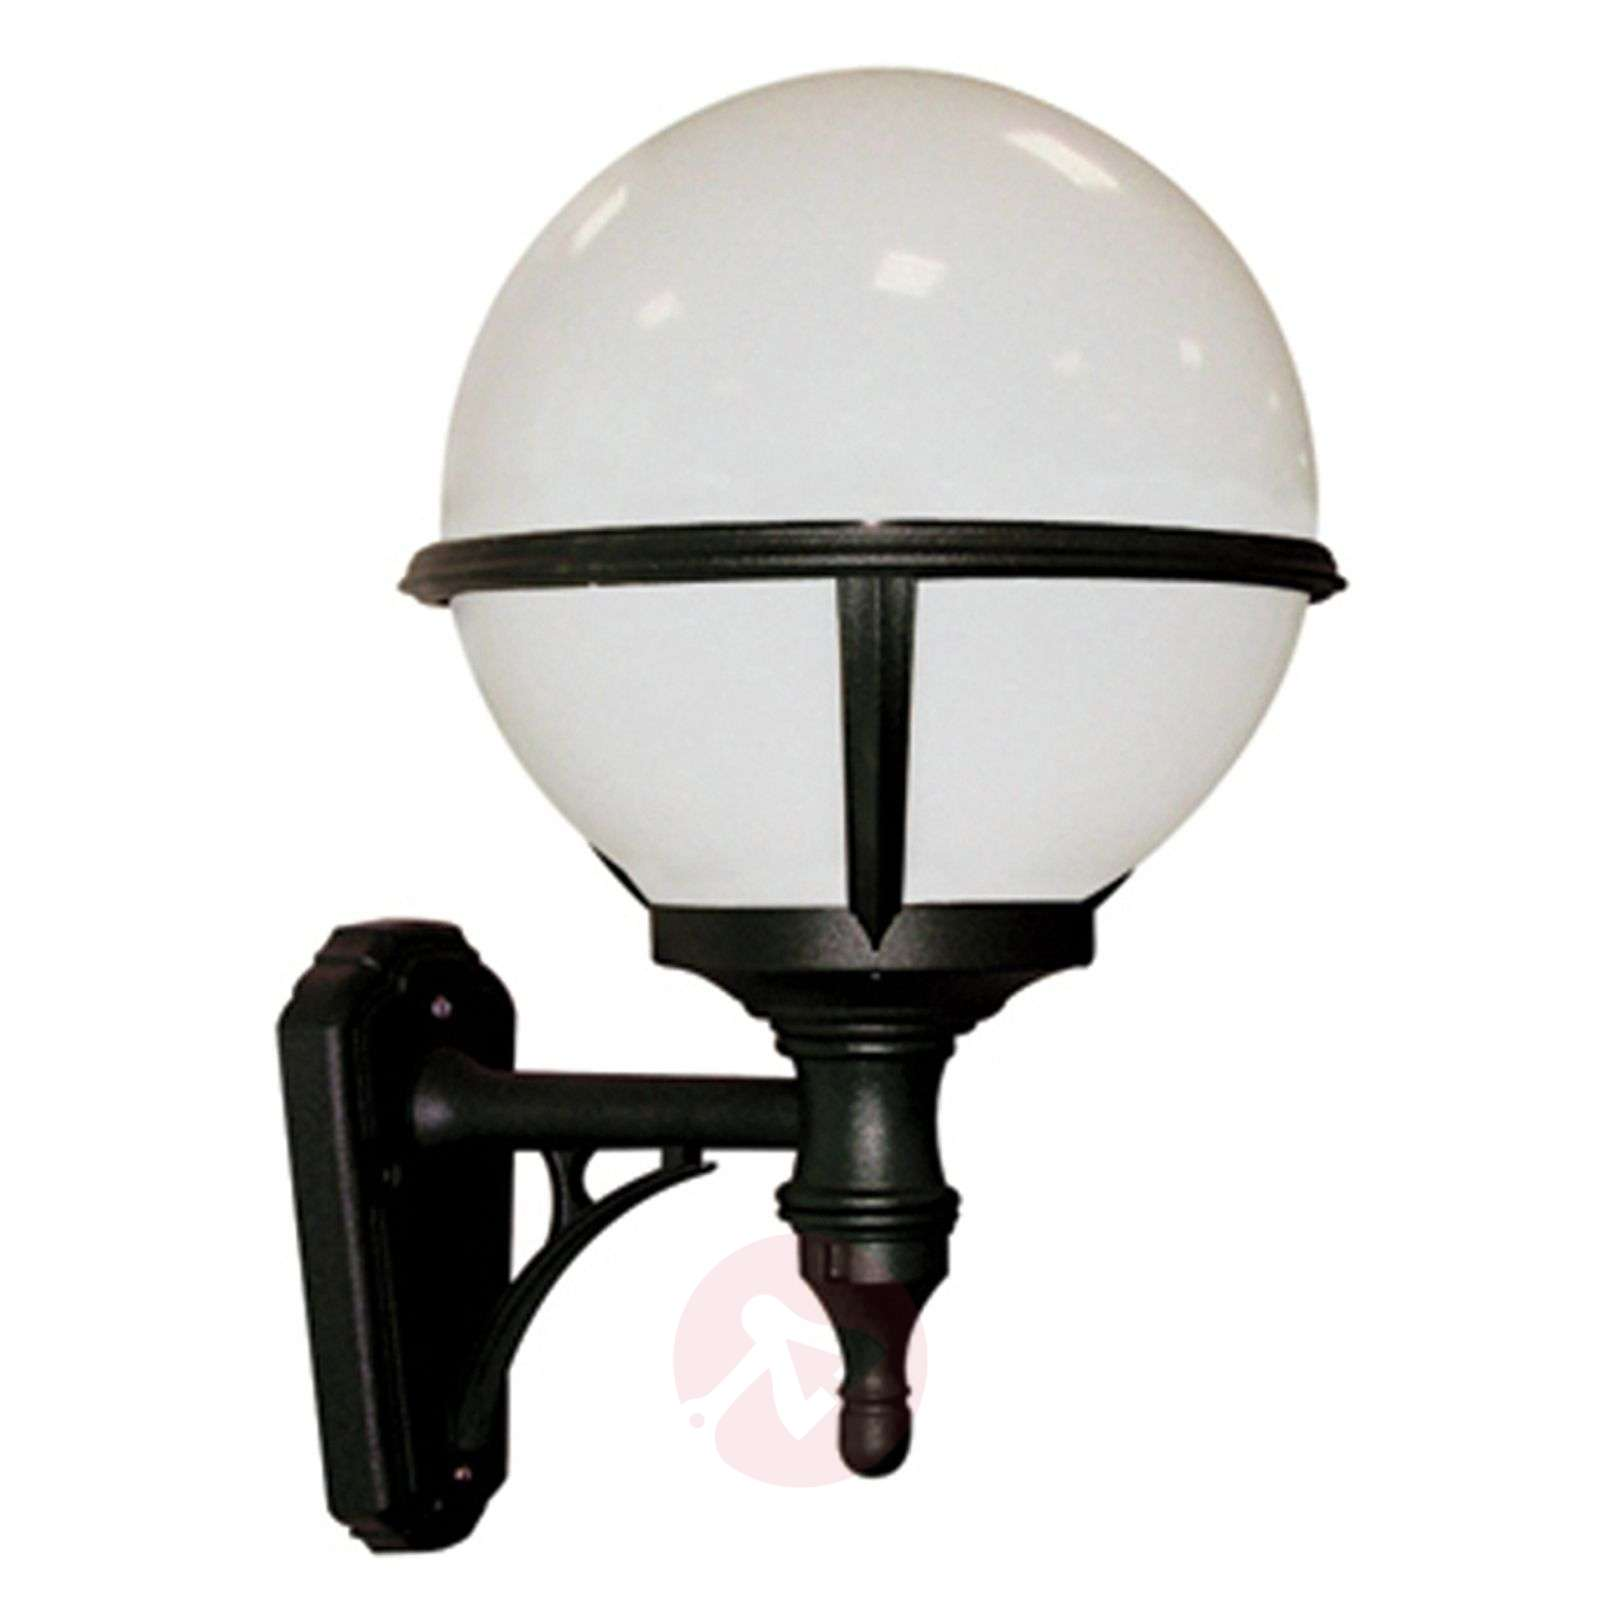 Glenbeigh outdoor wall light for coastal regions-3048407-01